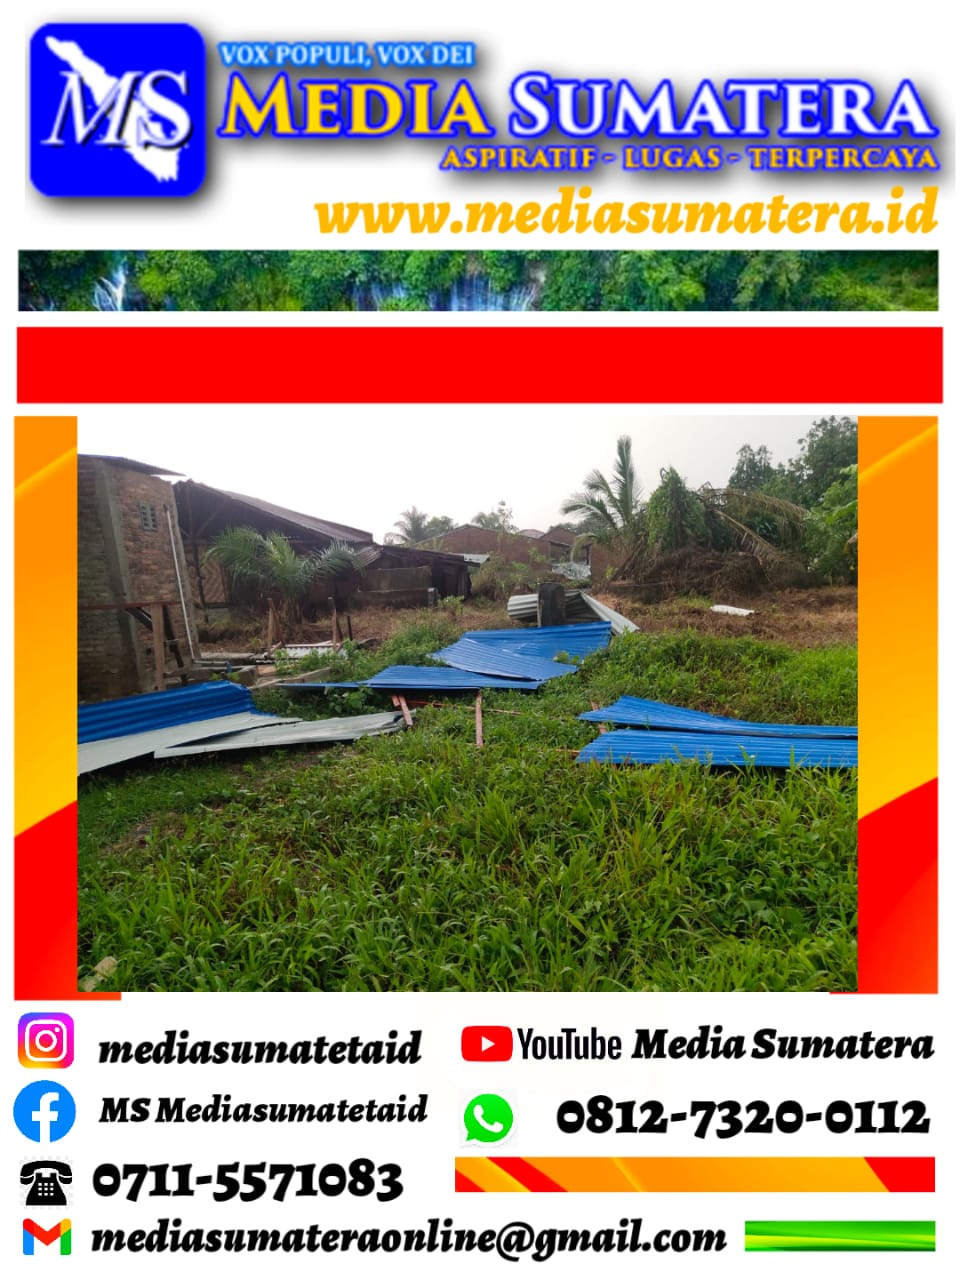 Angin Puting Beliung Porak Porandakan Rumah Warga Kecamatan Biru Biru Kabupaten Deli Serdang Sumatera Utara